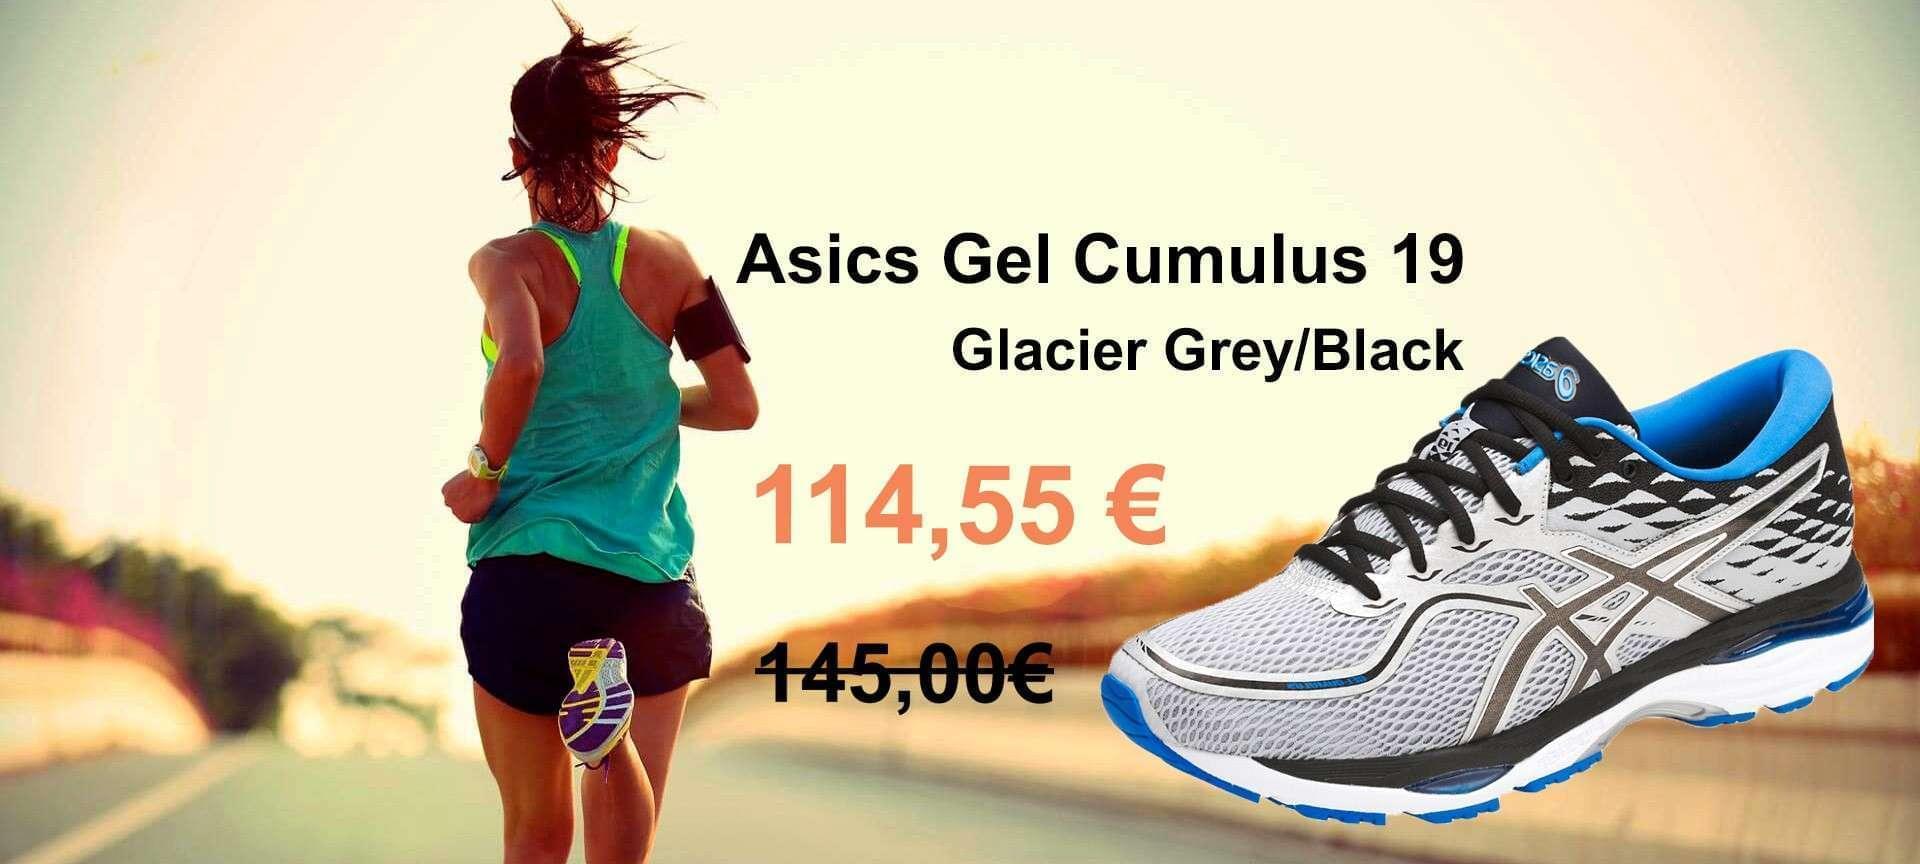 Asics Scarpa Gel Cumulus 19 Glacier Grey/Black